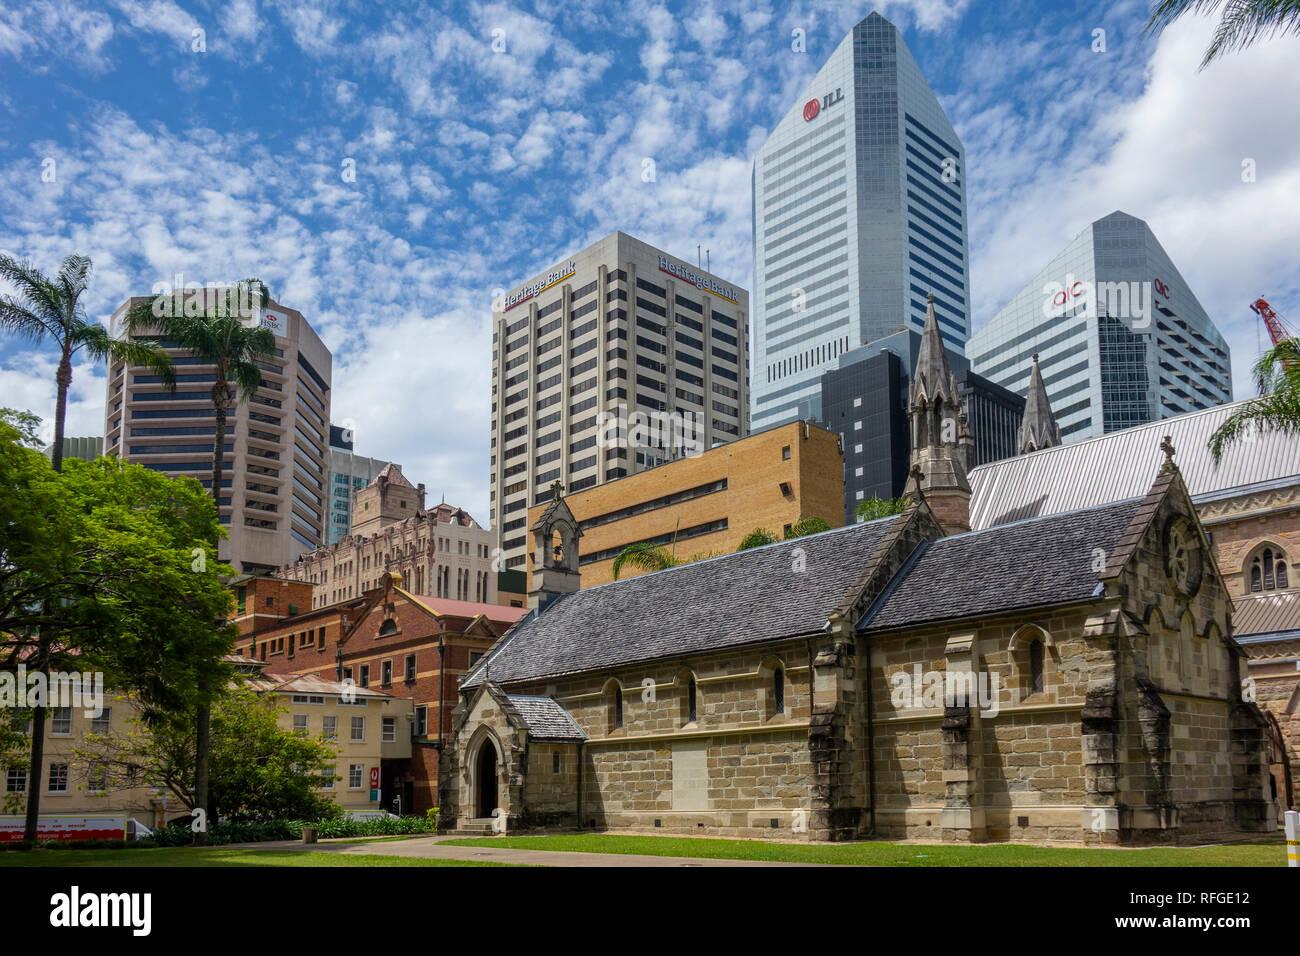 Australia, Queensland, Brisbane, St.Stephens cathedral chapel & modern city - Stock Image